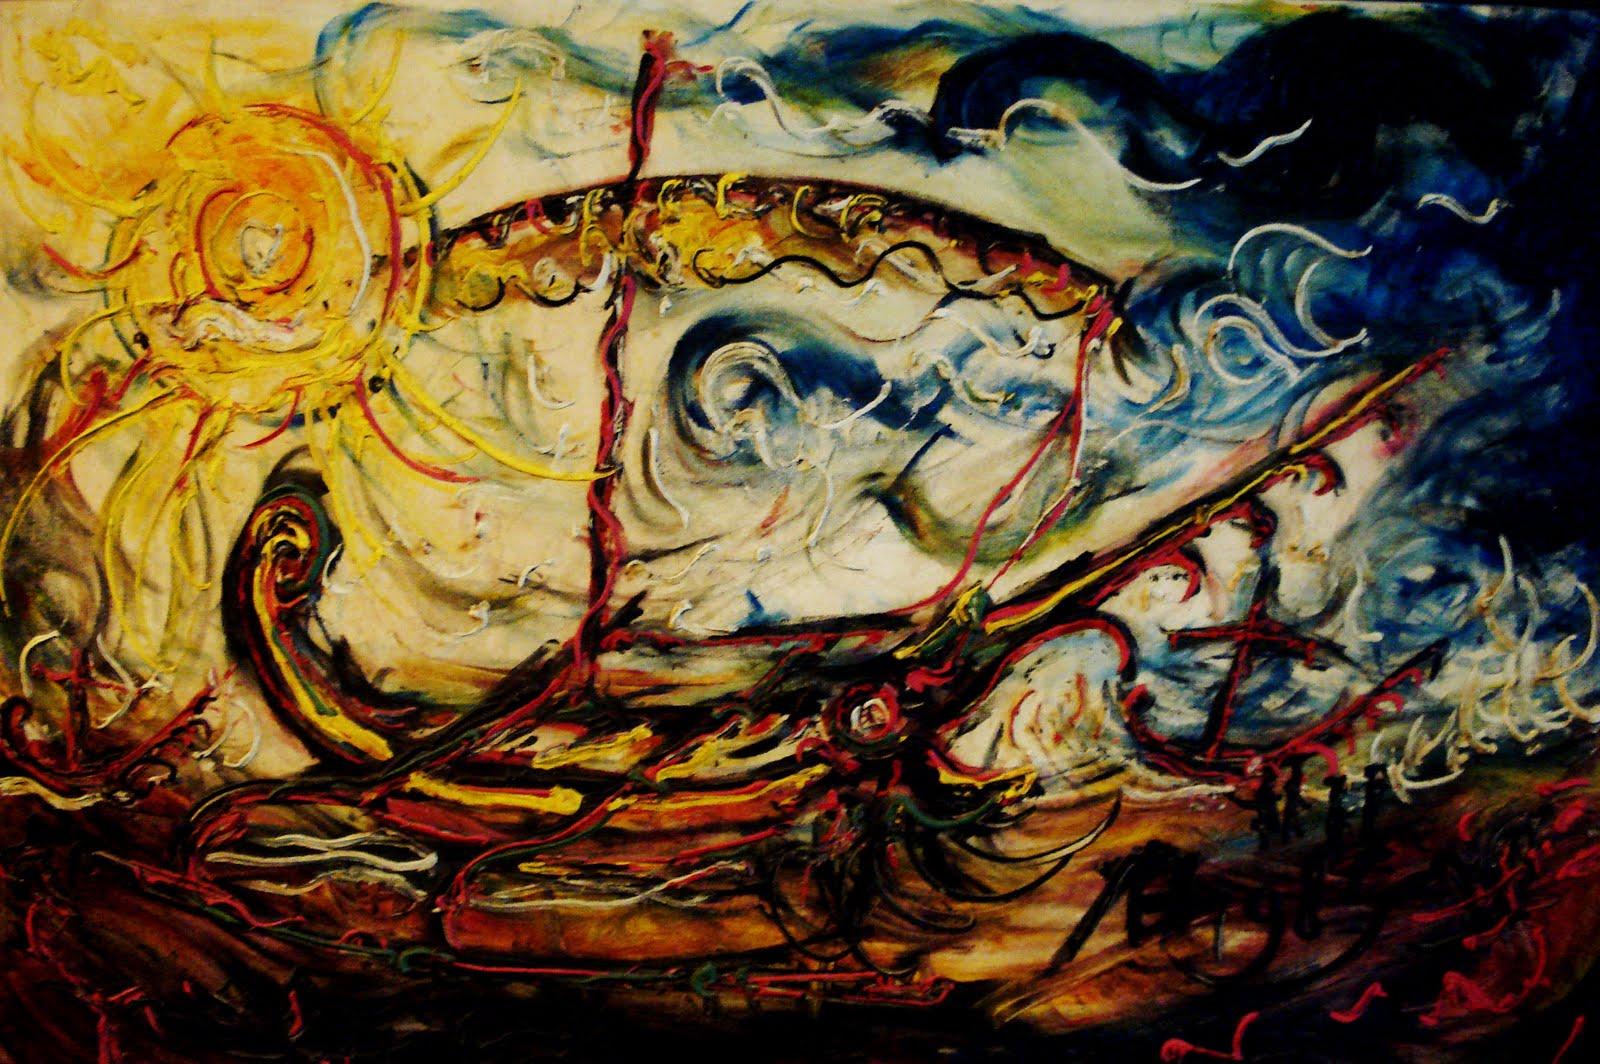 Lukisan Abstrak Hem: Macam-macam Aliran Seni Lukis Lengkap Dengan Contoh Lukisannya